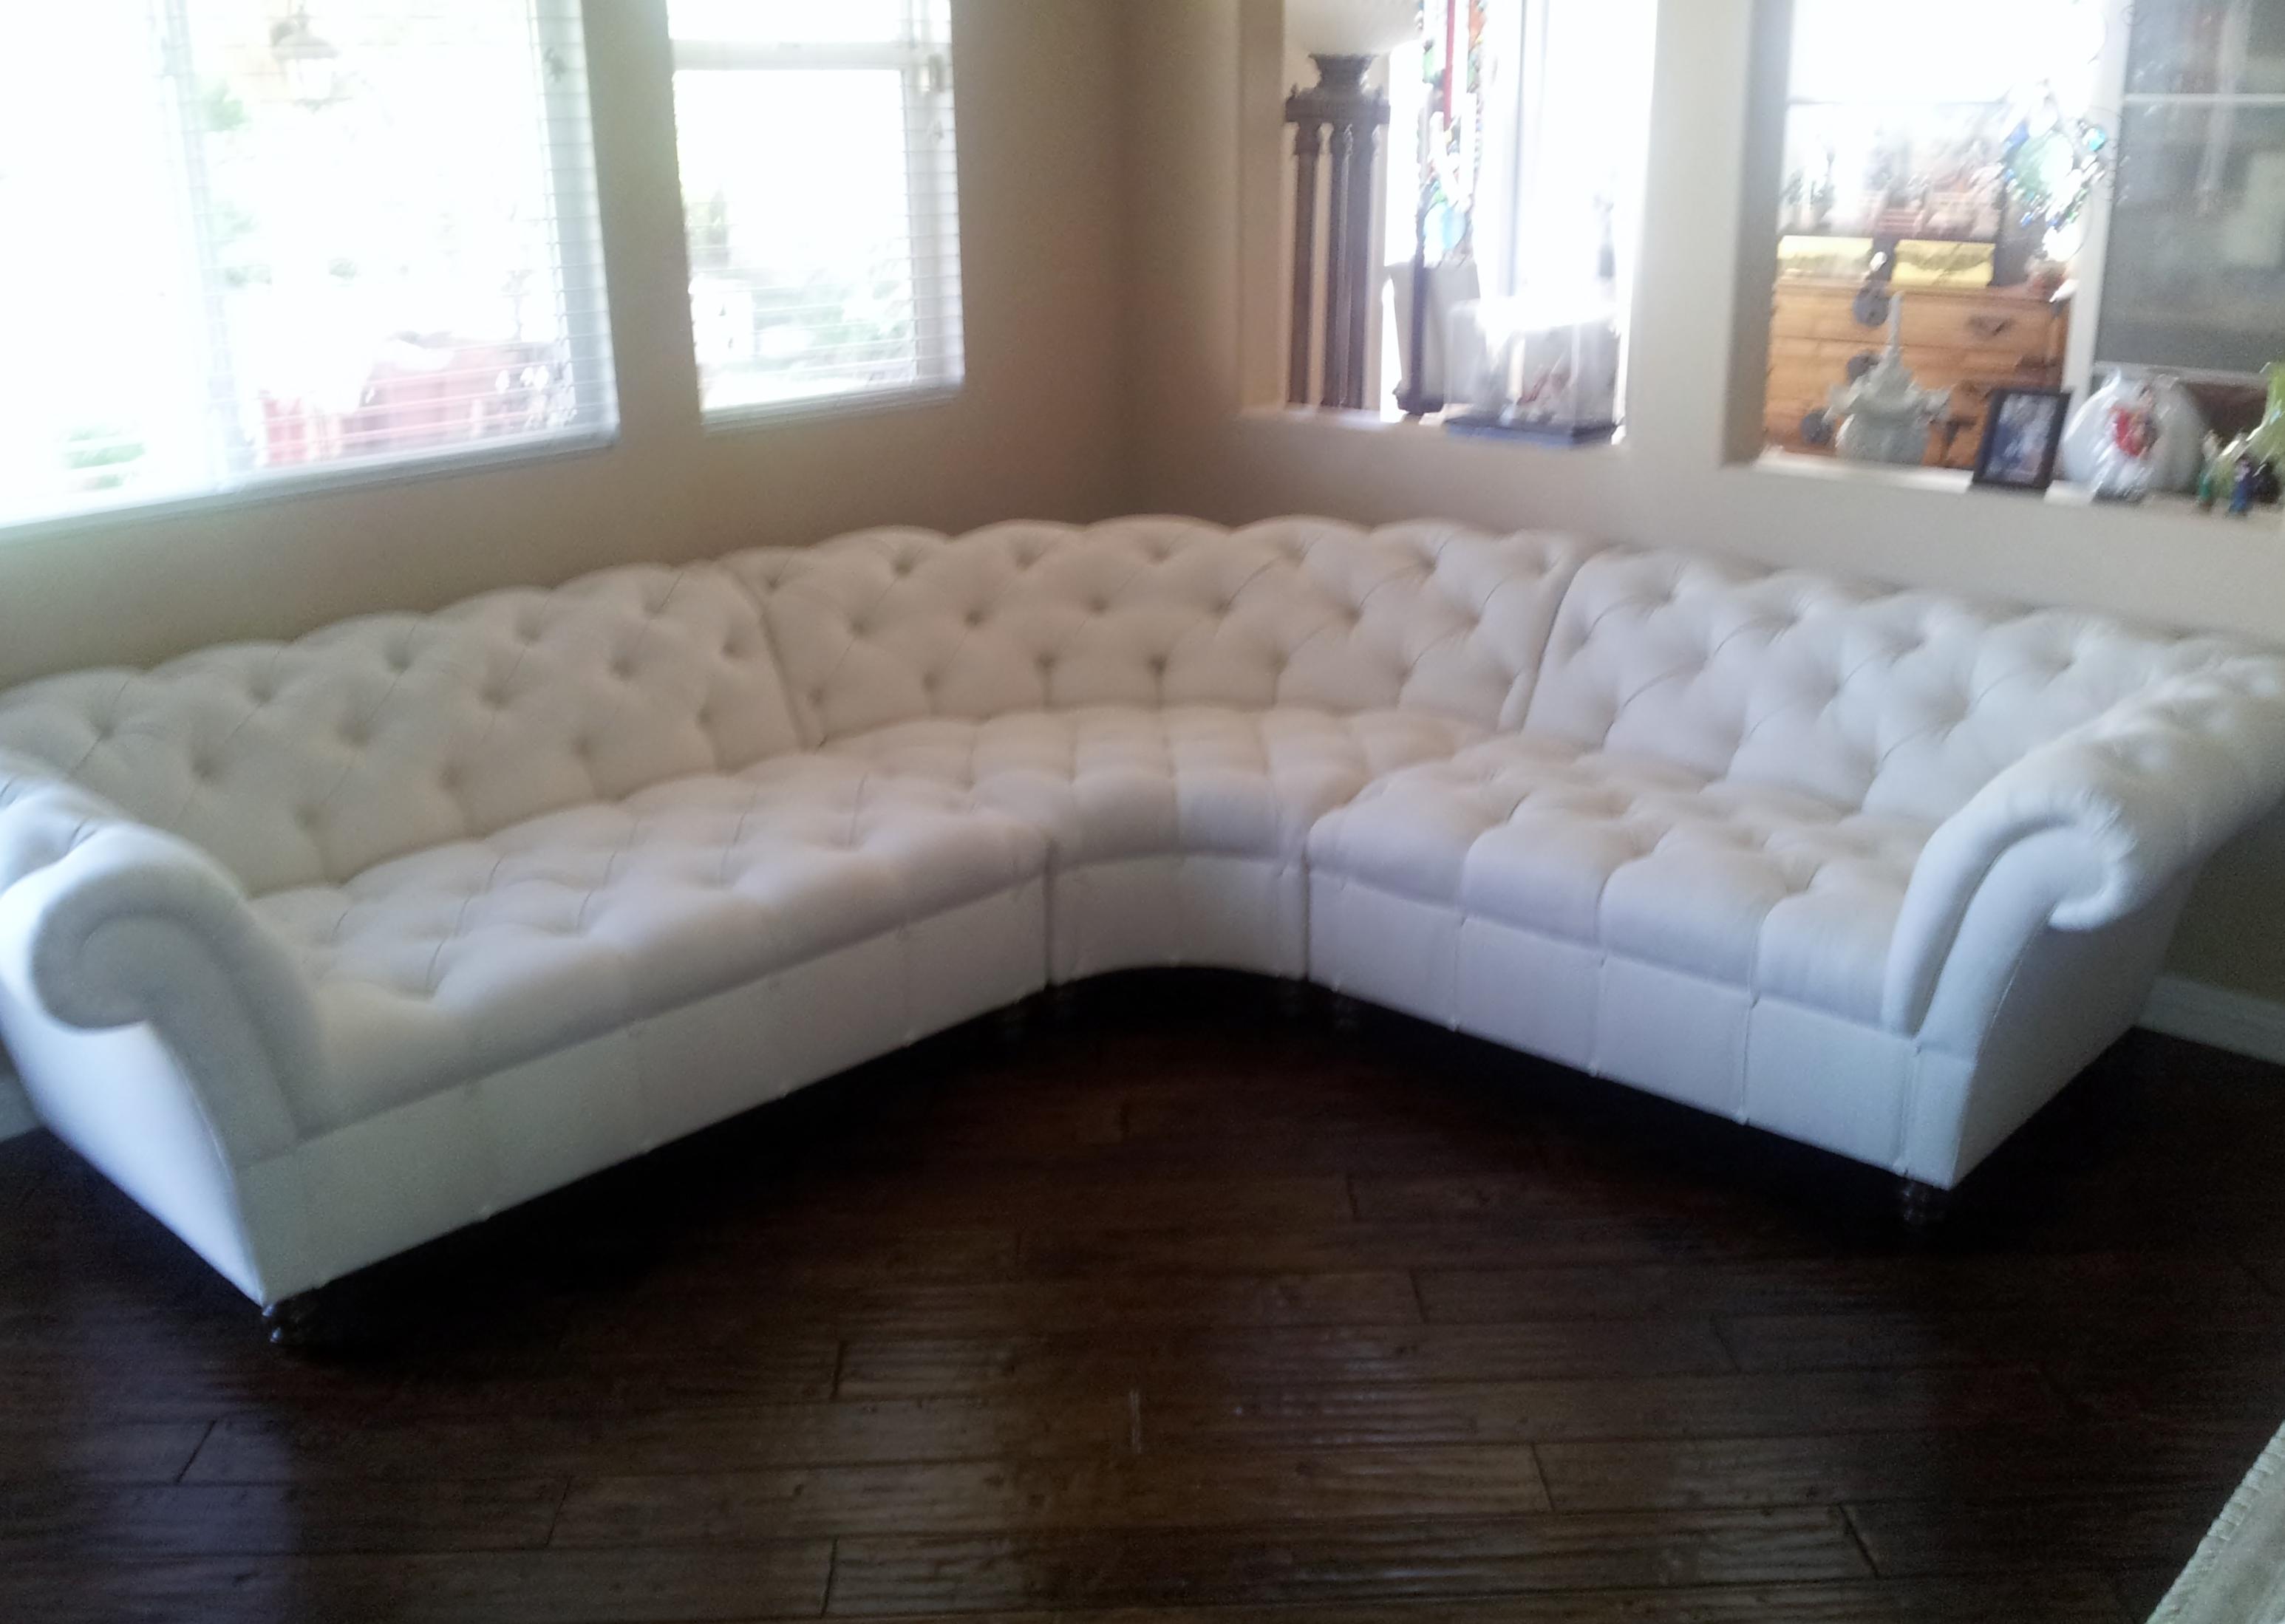 Sofa Custom Leather Sofas Made Uk Furniture San Diego North Carolina Within North Carolina Sectional Sofas (View 8 of 10)